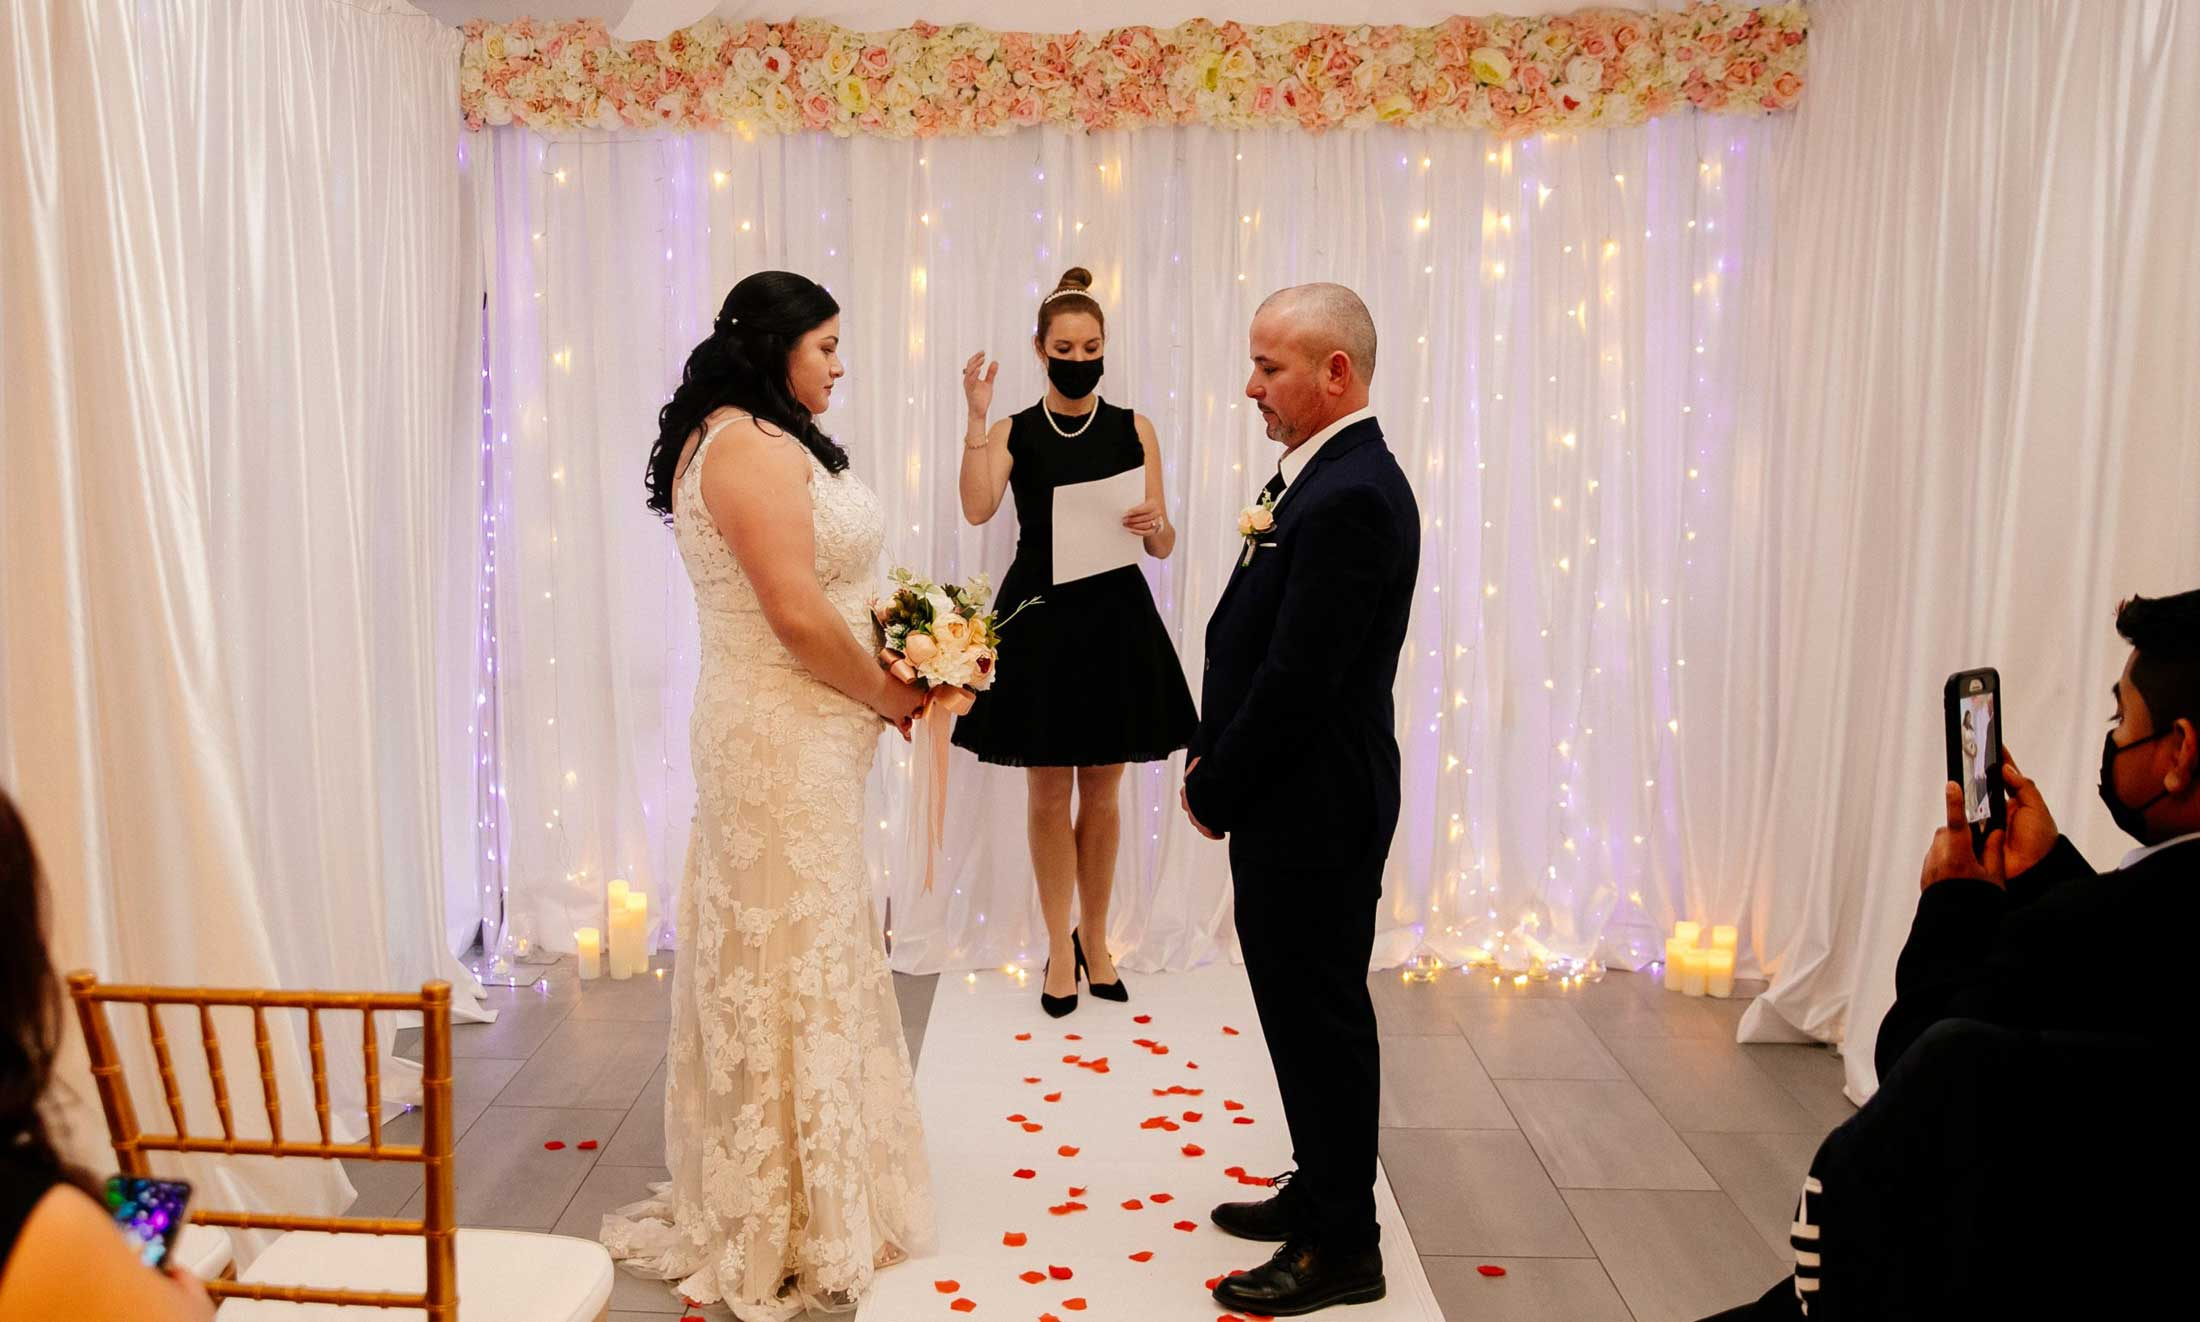 Wedding ceremony in Love Chapel, Upper West Side